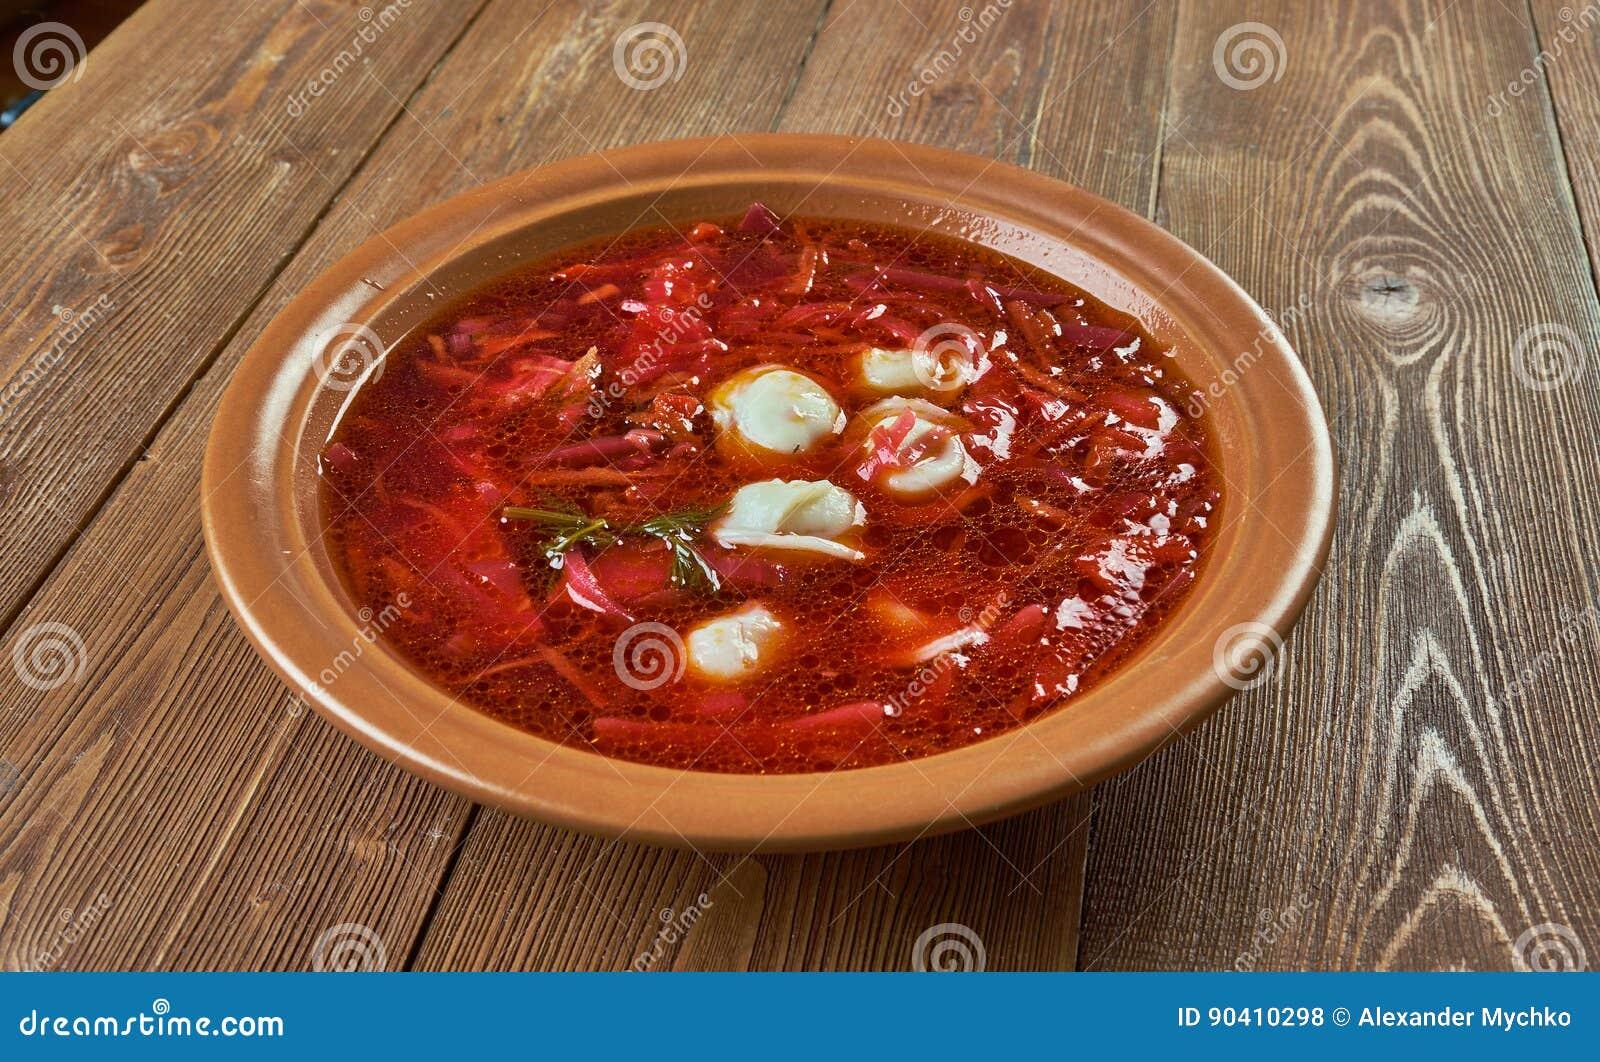 Polish Beet Soup With Dumplings Stock Photo - Image: 90410298